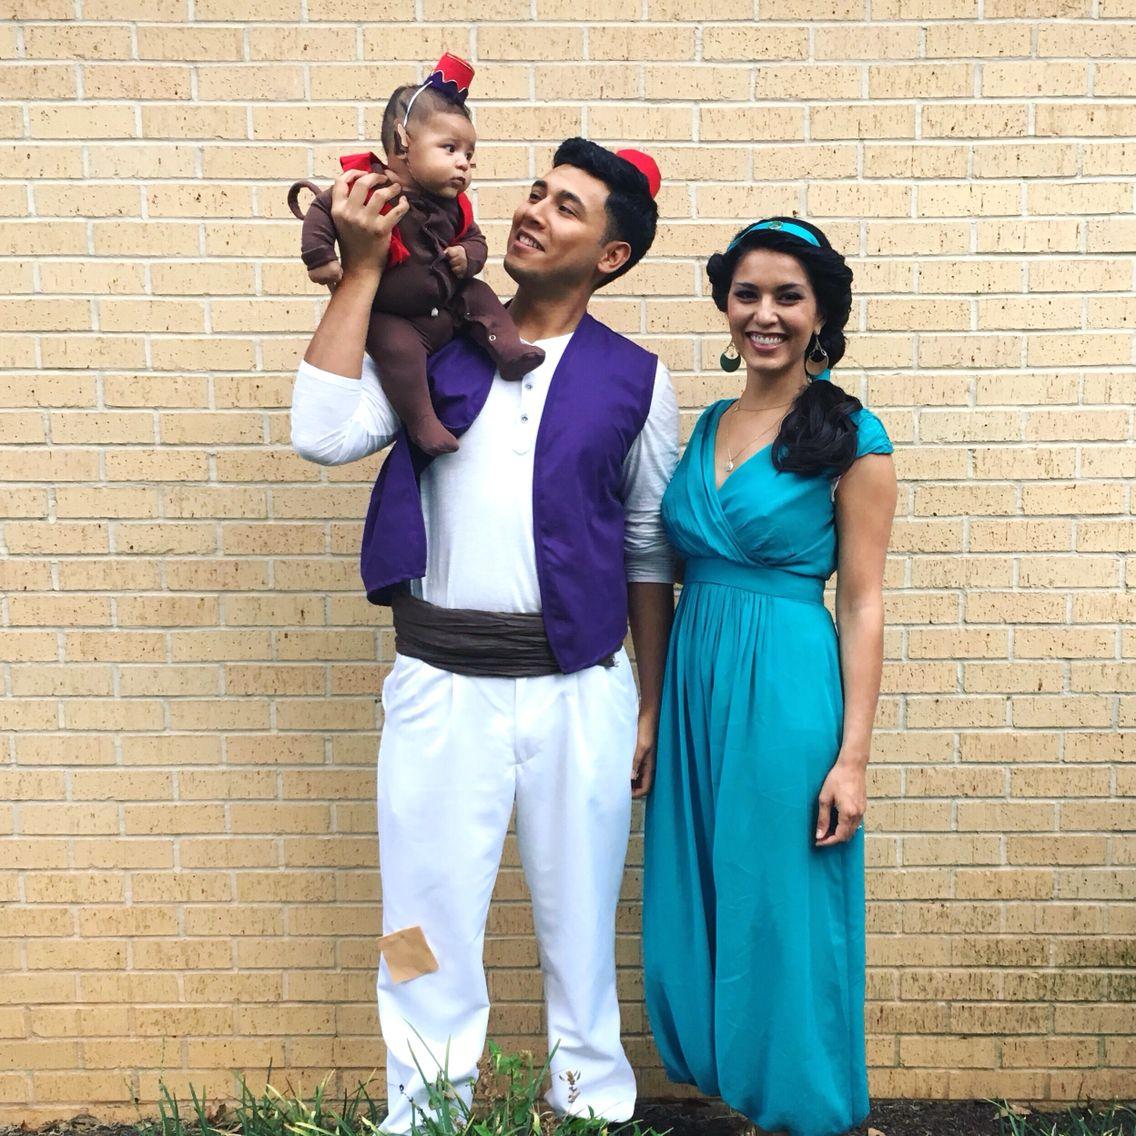 Halloween costuming | Jasmine, Costumes and Halloween costumes